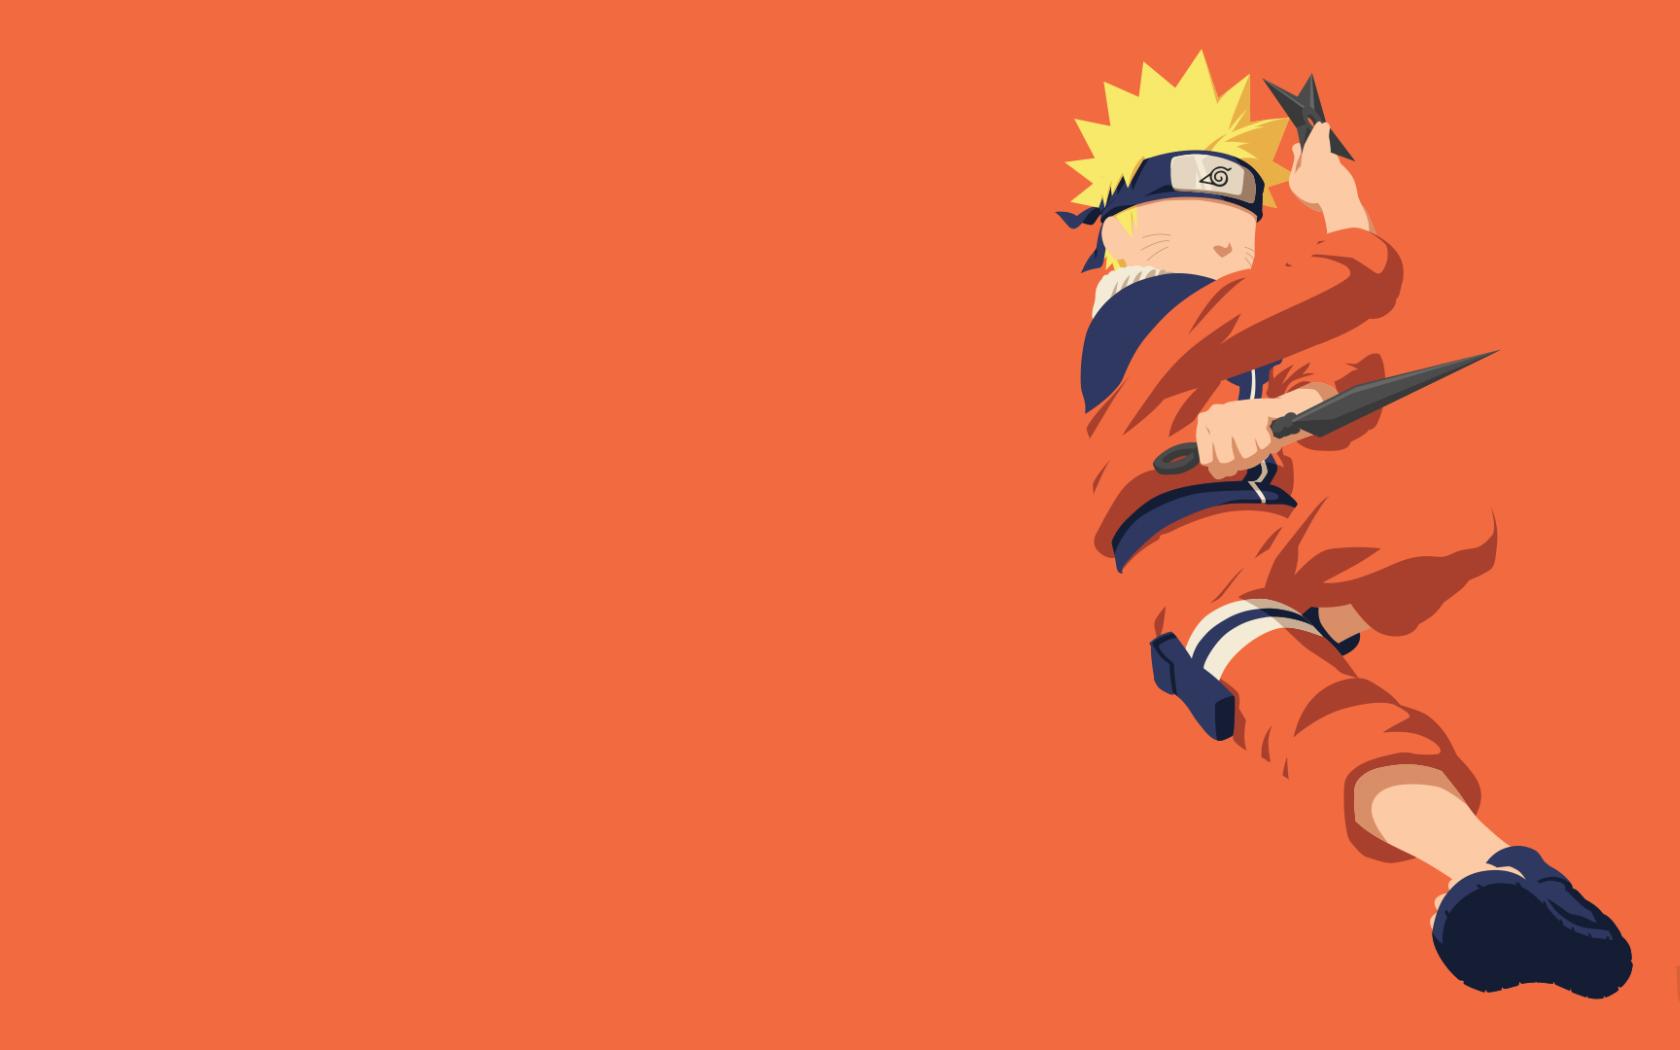 Naruto Kid Desktop Wallpapers - Wallpaper Cave